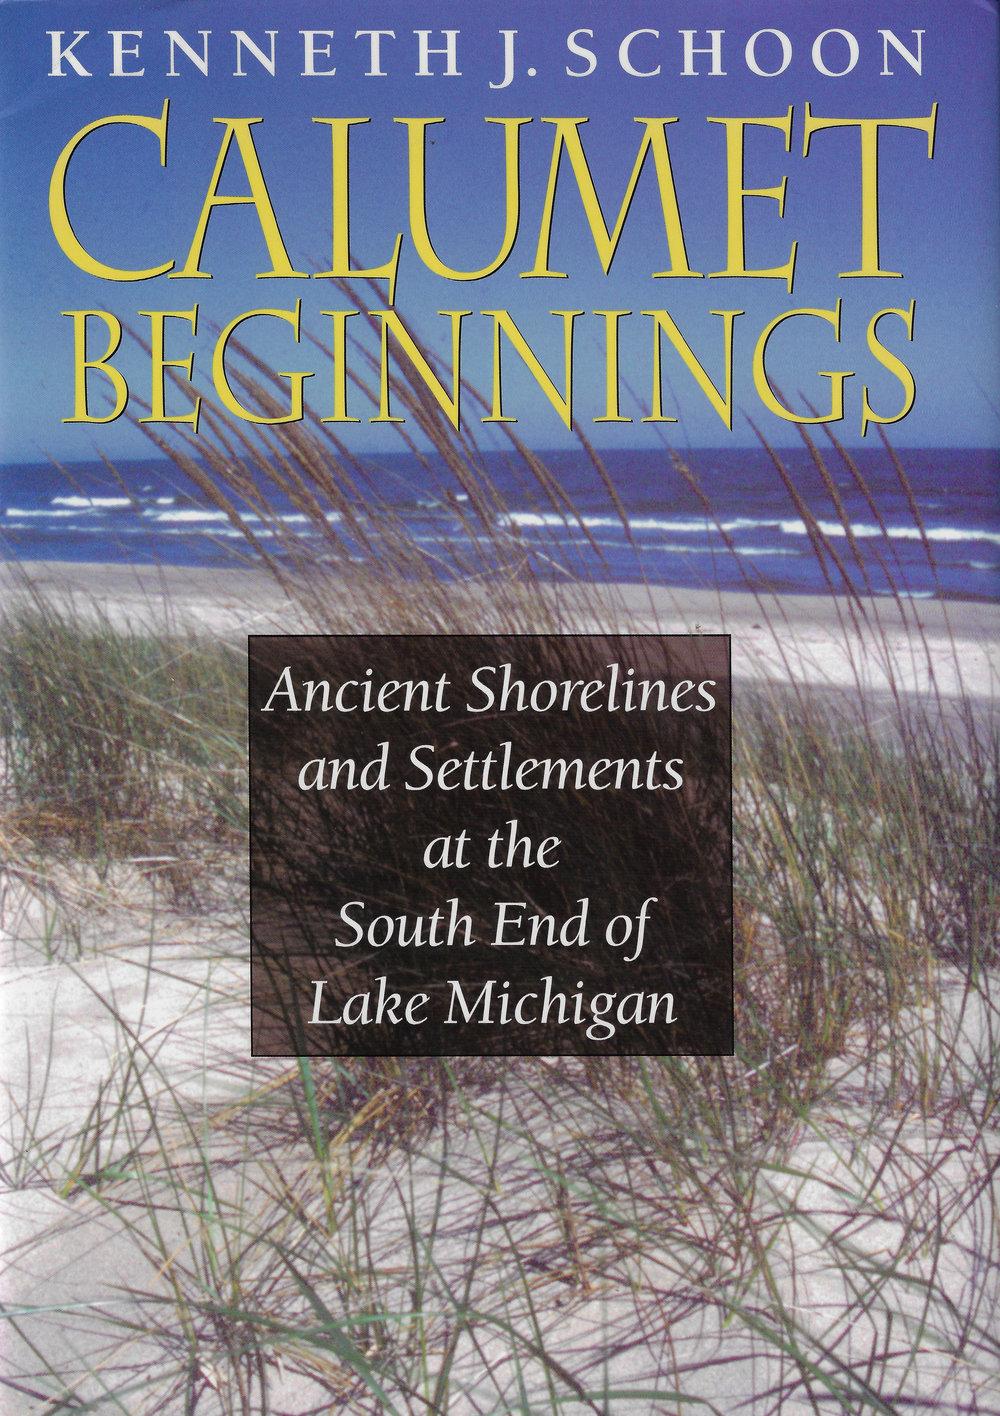 Calumet Beginnings by Kenneth J. Schoon